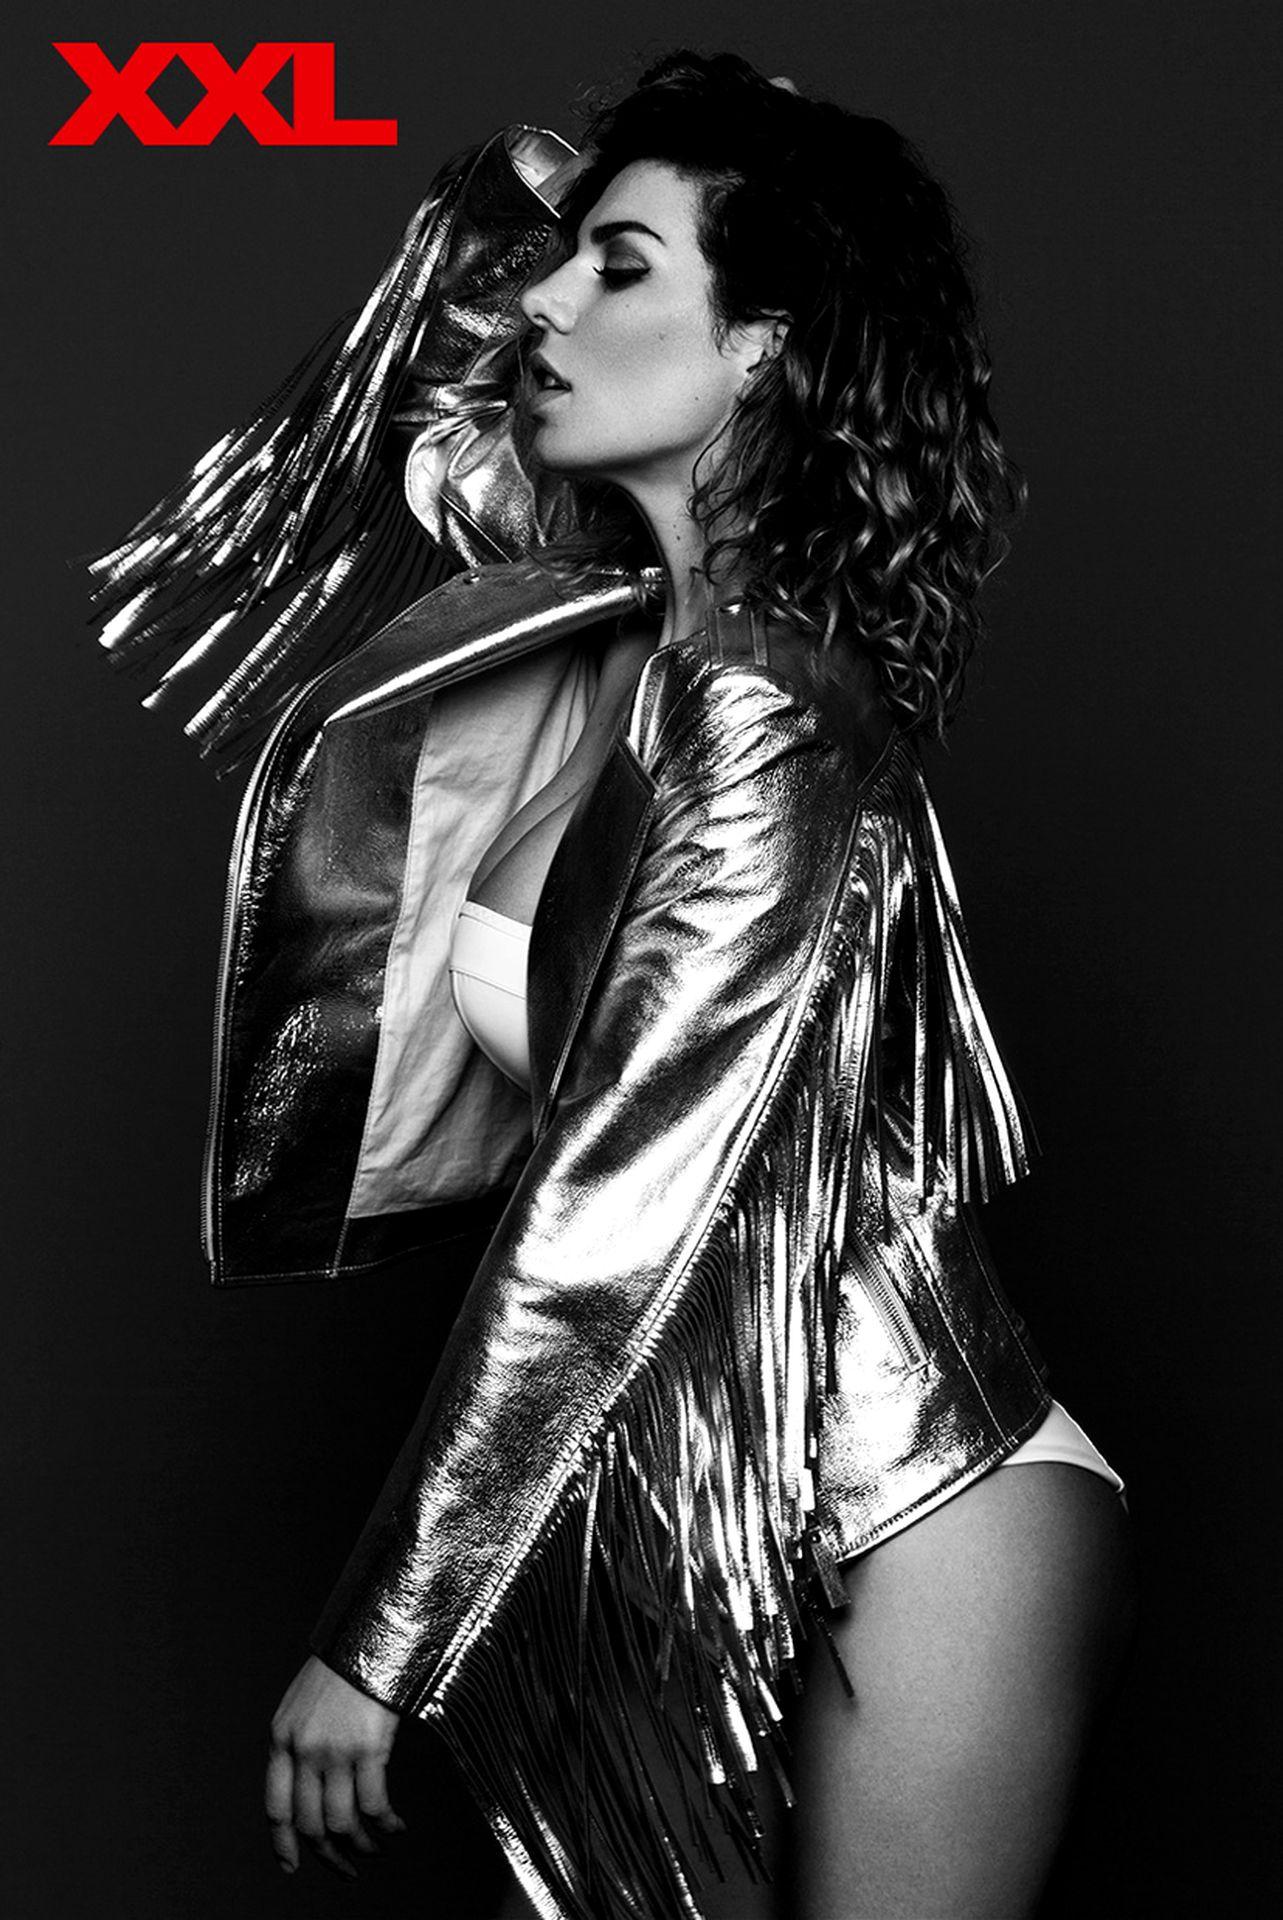 Голая Анна Седокова в максим фото Maxim май 2010